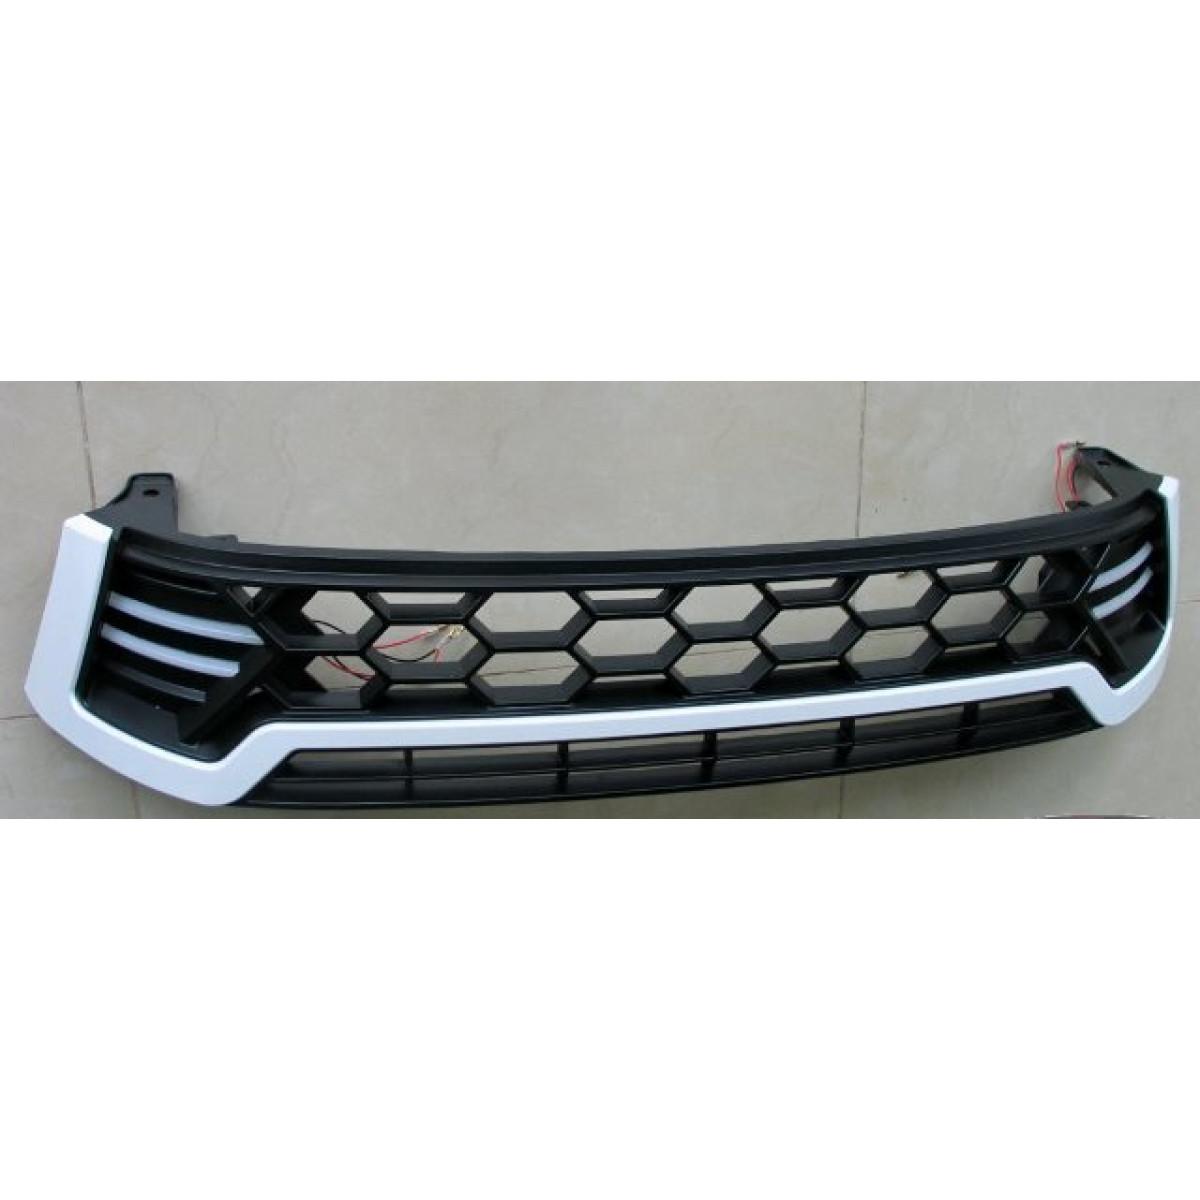 Решетка радиатора с LED DRL для Toyota Hilux 2016+